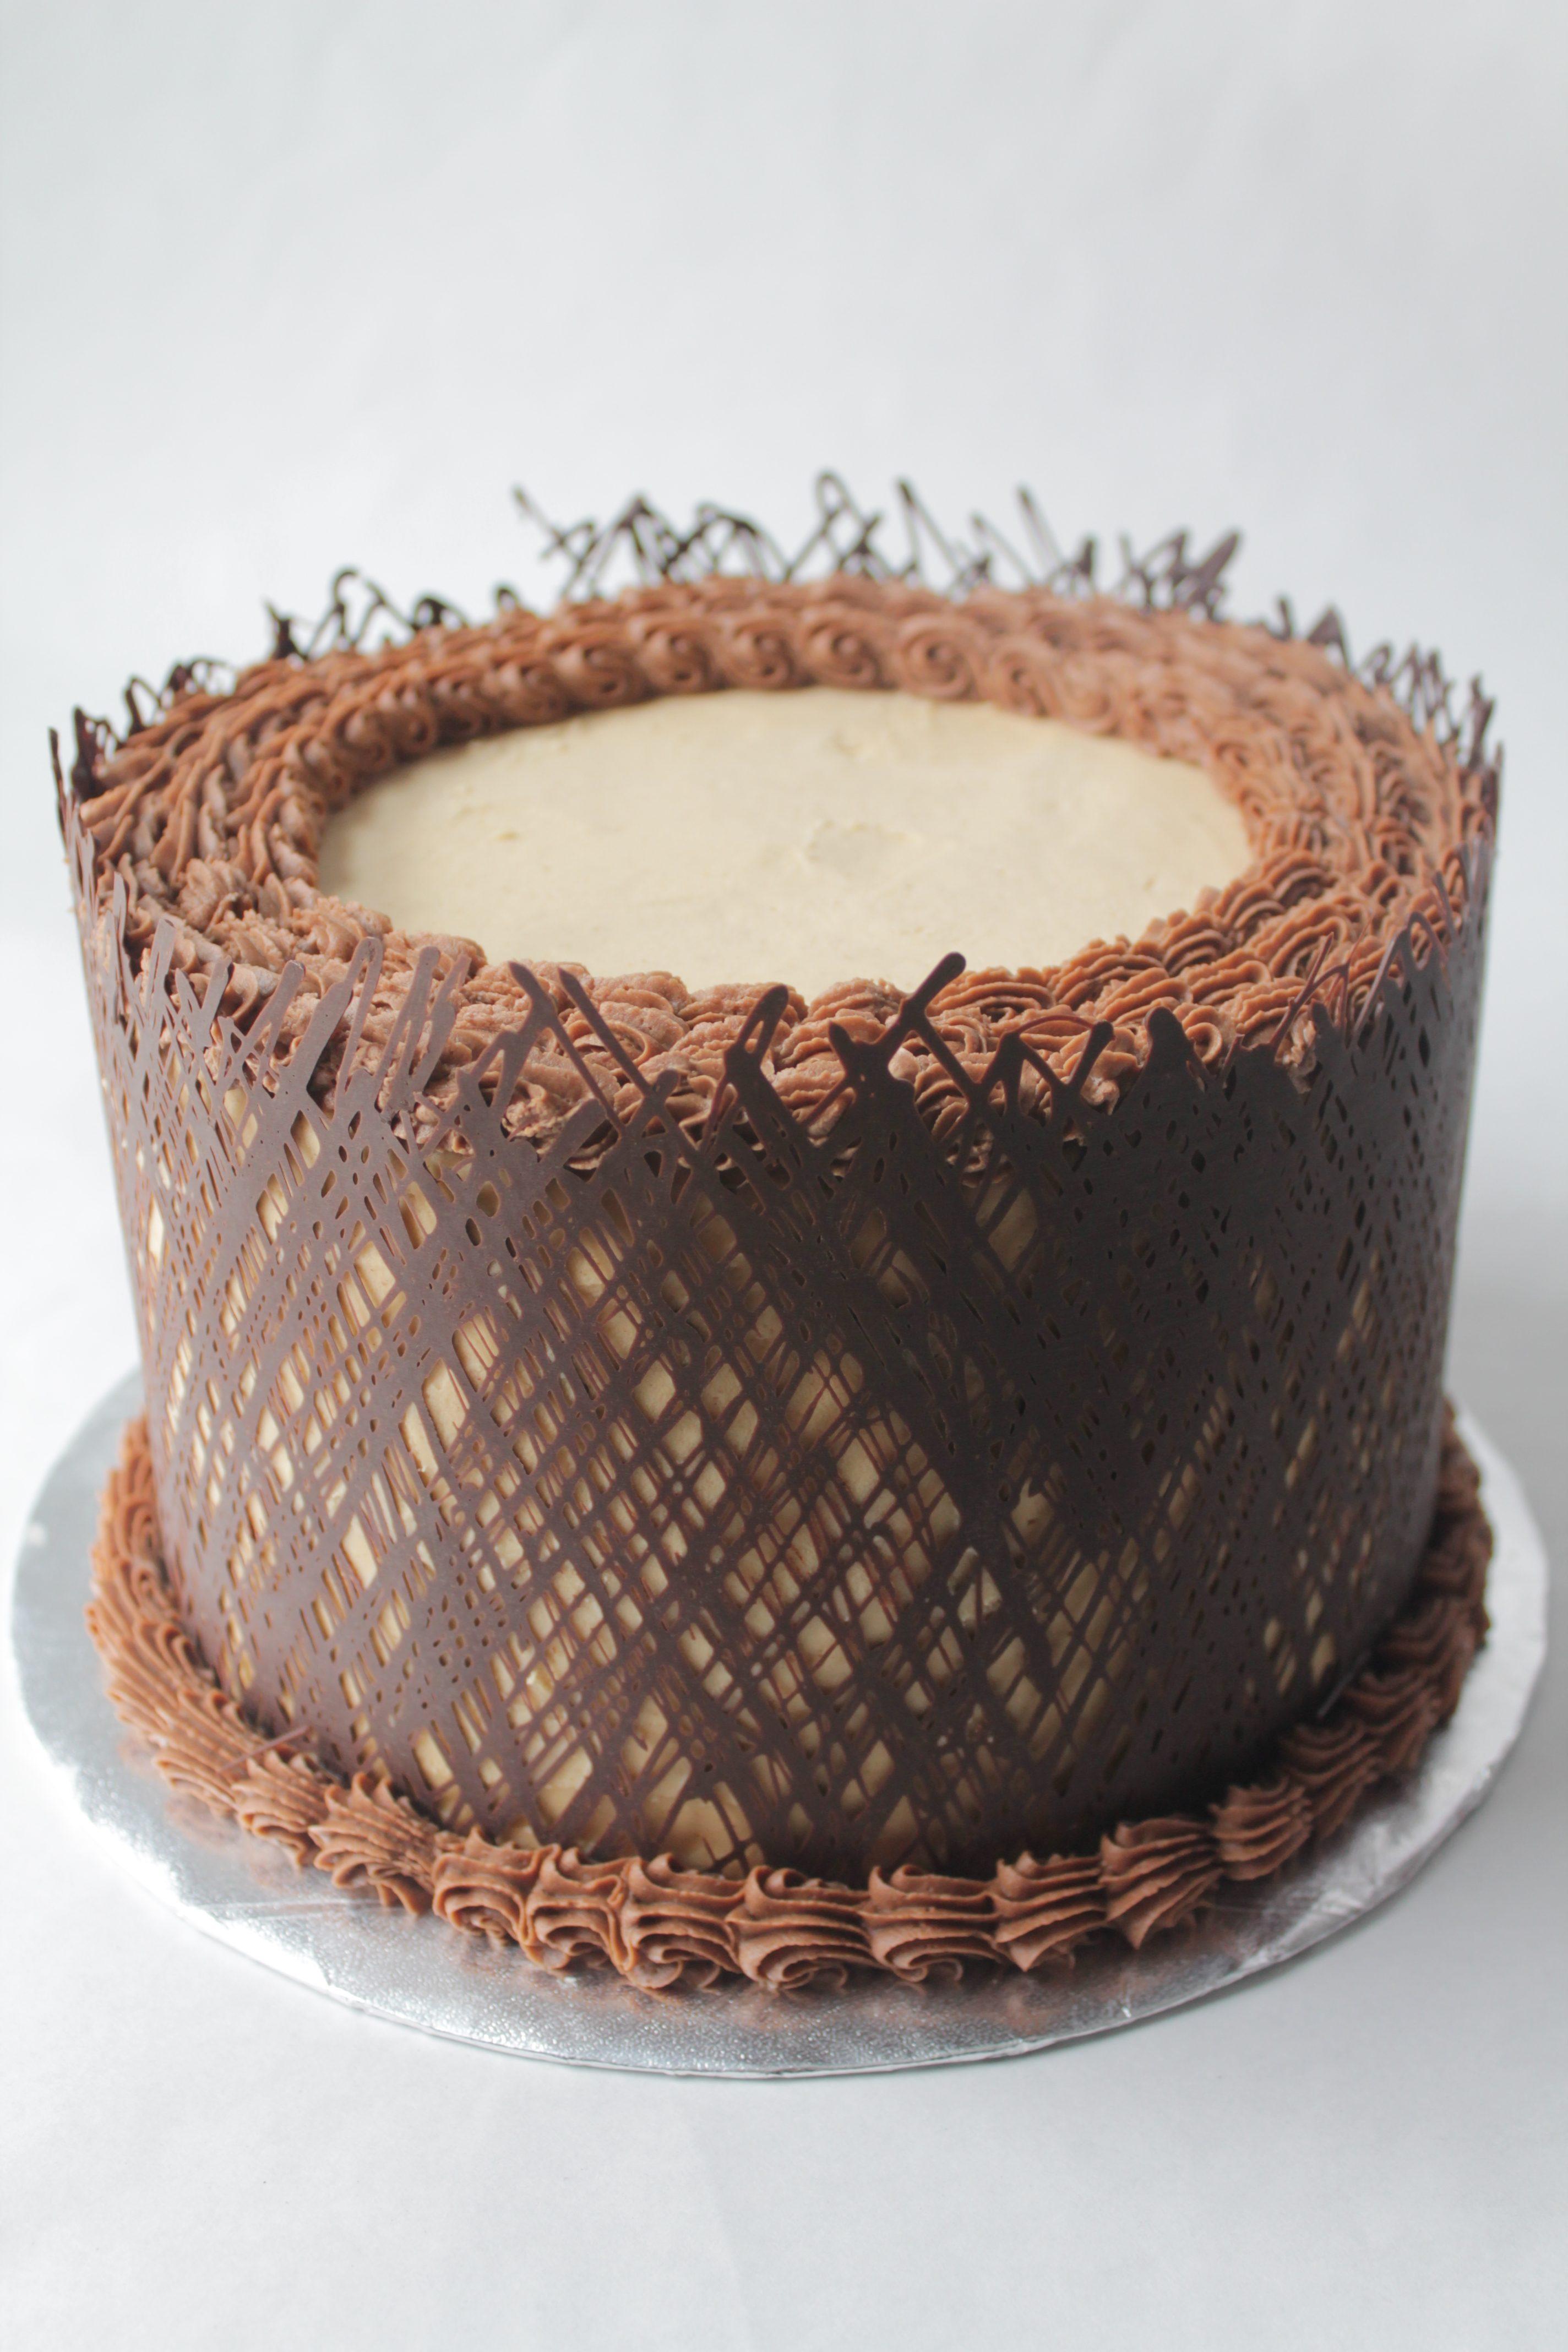 Chocolate wrapped cake